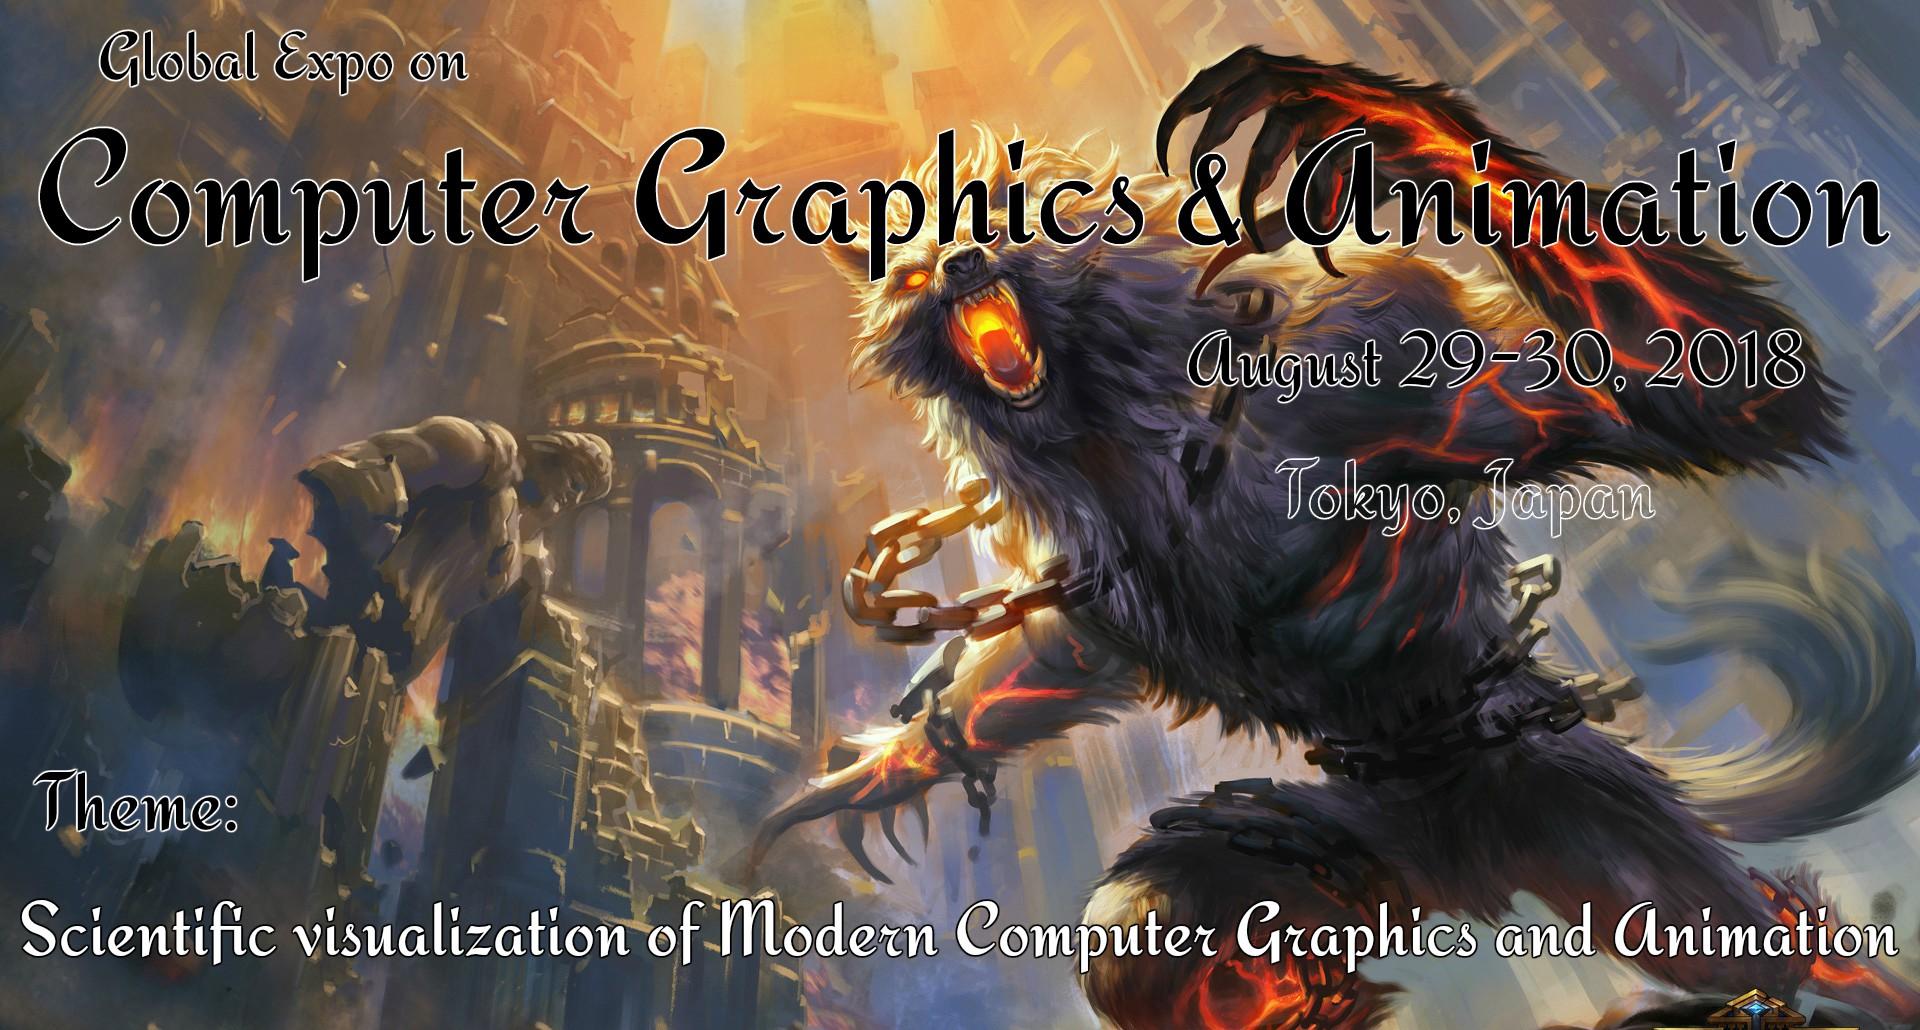 Global Expo on Computer Graphics and Animations